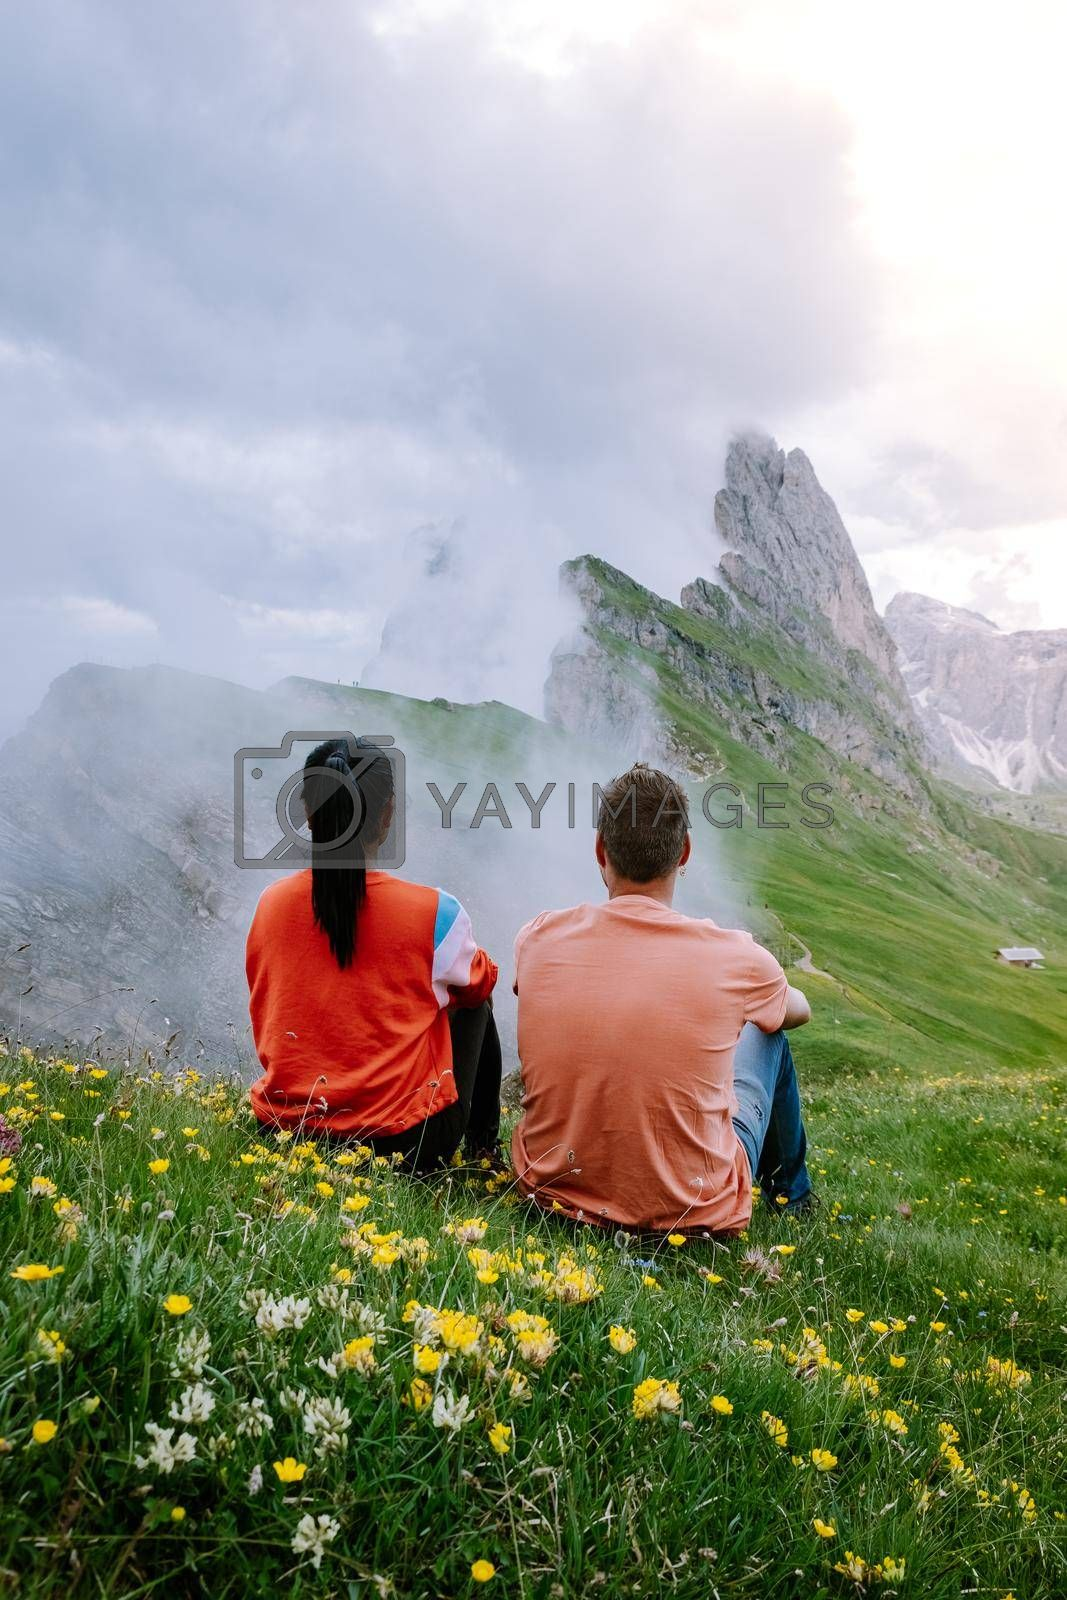 couple on vacation hiking in the Italien Dolomites, Amazing view on Seceda peak. Trentino Alto Adige, Dolomites Alps, South Tyrol, Italy, Europe. Odle mountain range, Val Gardena. Majestic Furchetta peak in morning sunlight. Italy